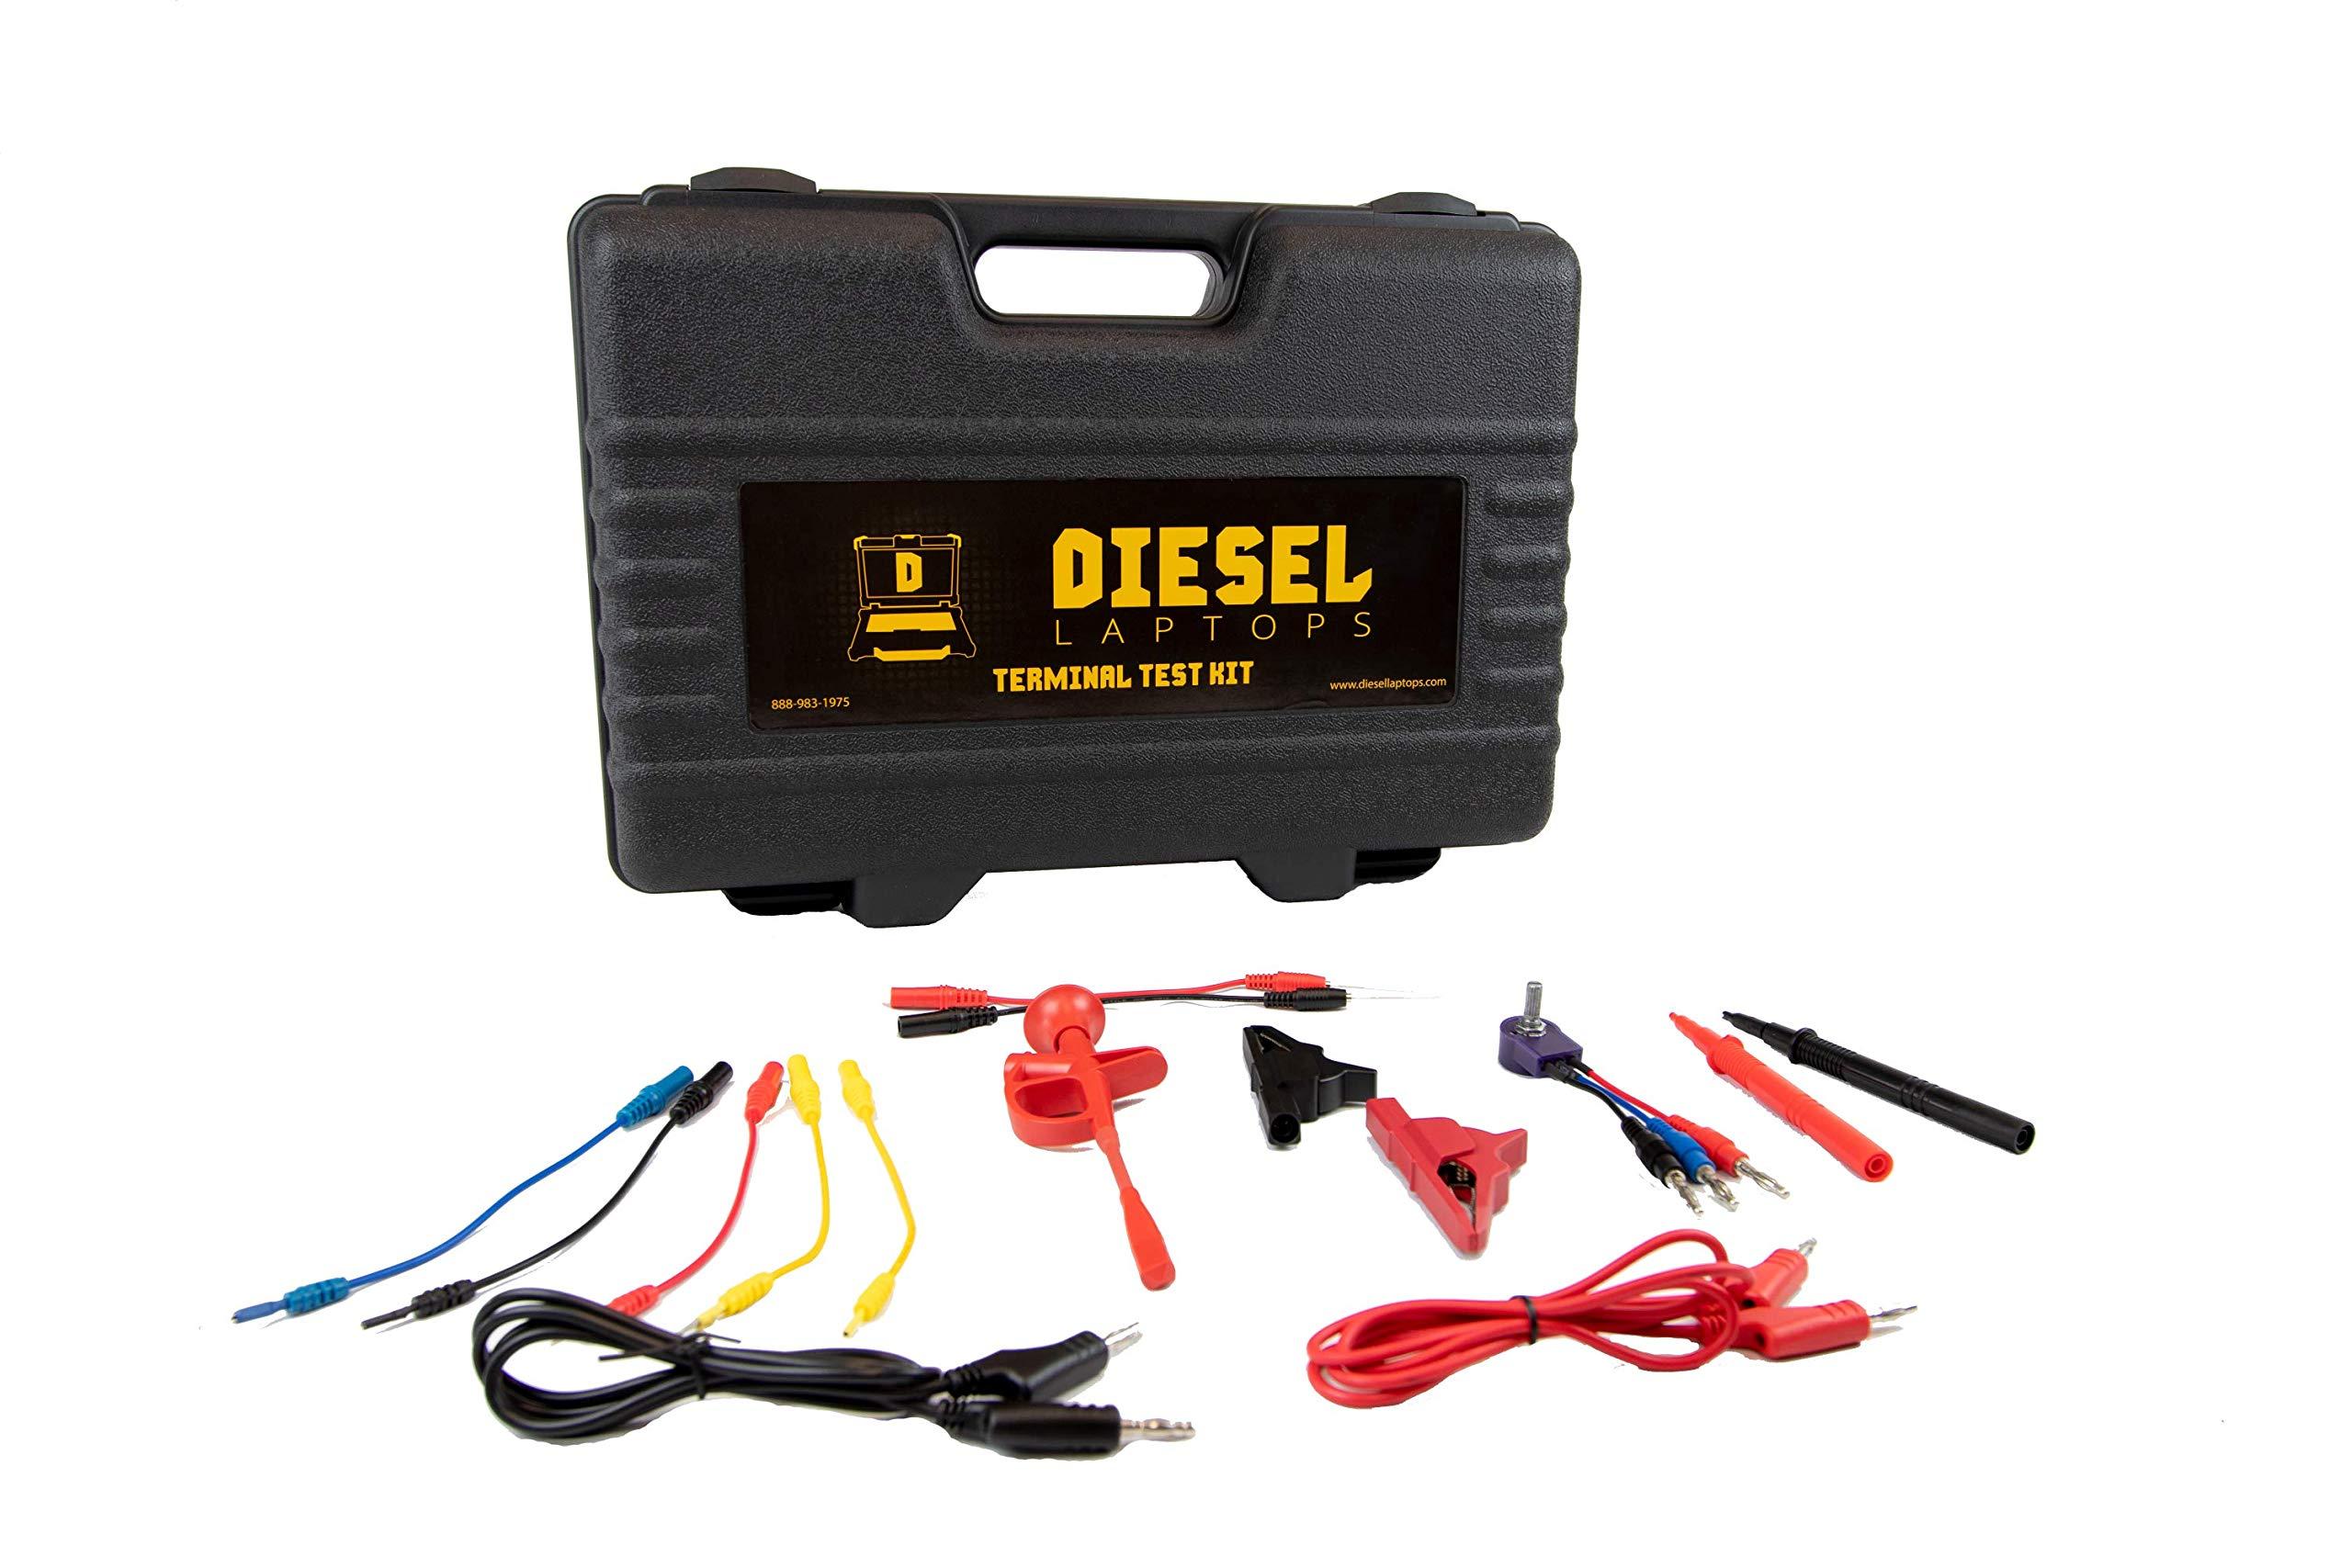 Diesel Laptops 94 Piece Electrical Diagnostic Terminal Test Kit by Diesel Laptops (Image #3)